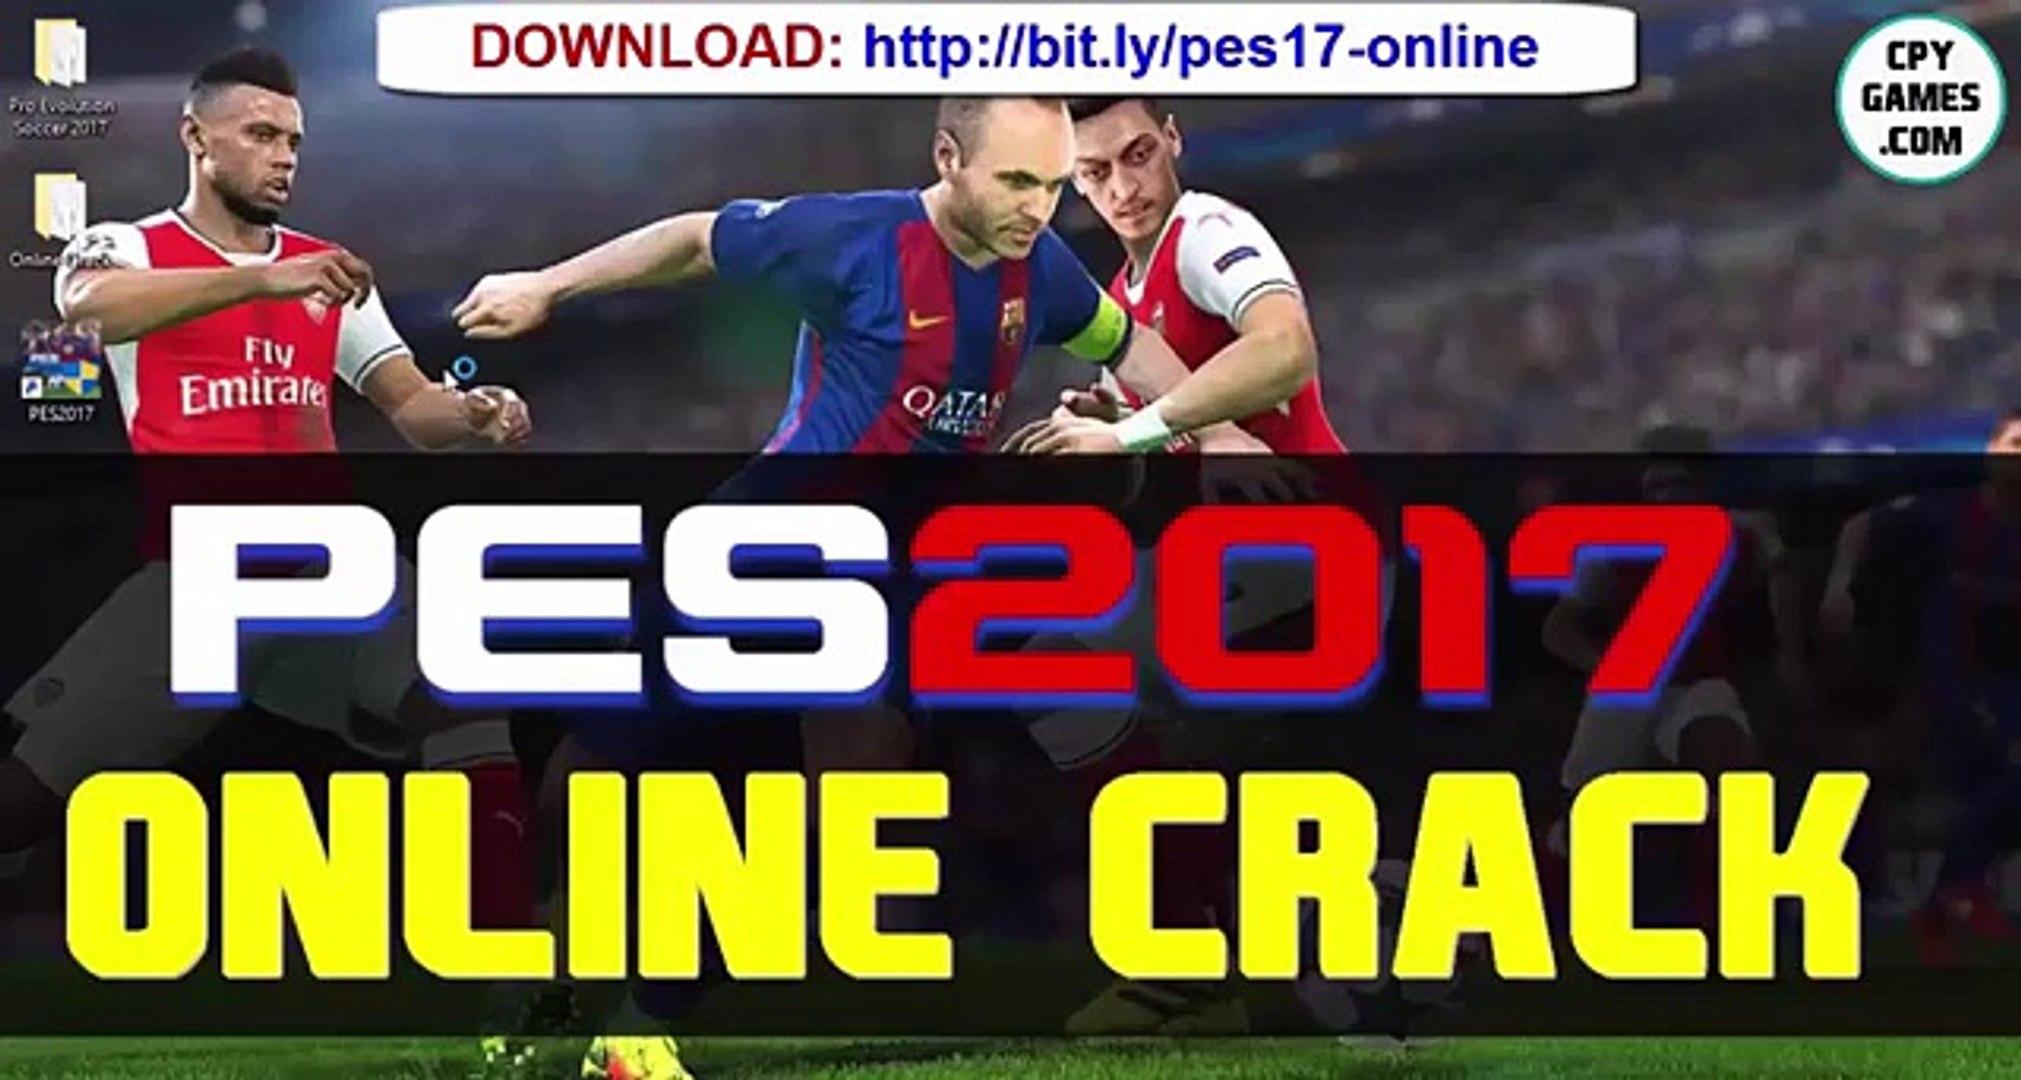 crack online pes 2017 pc